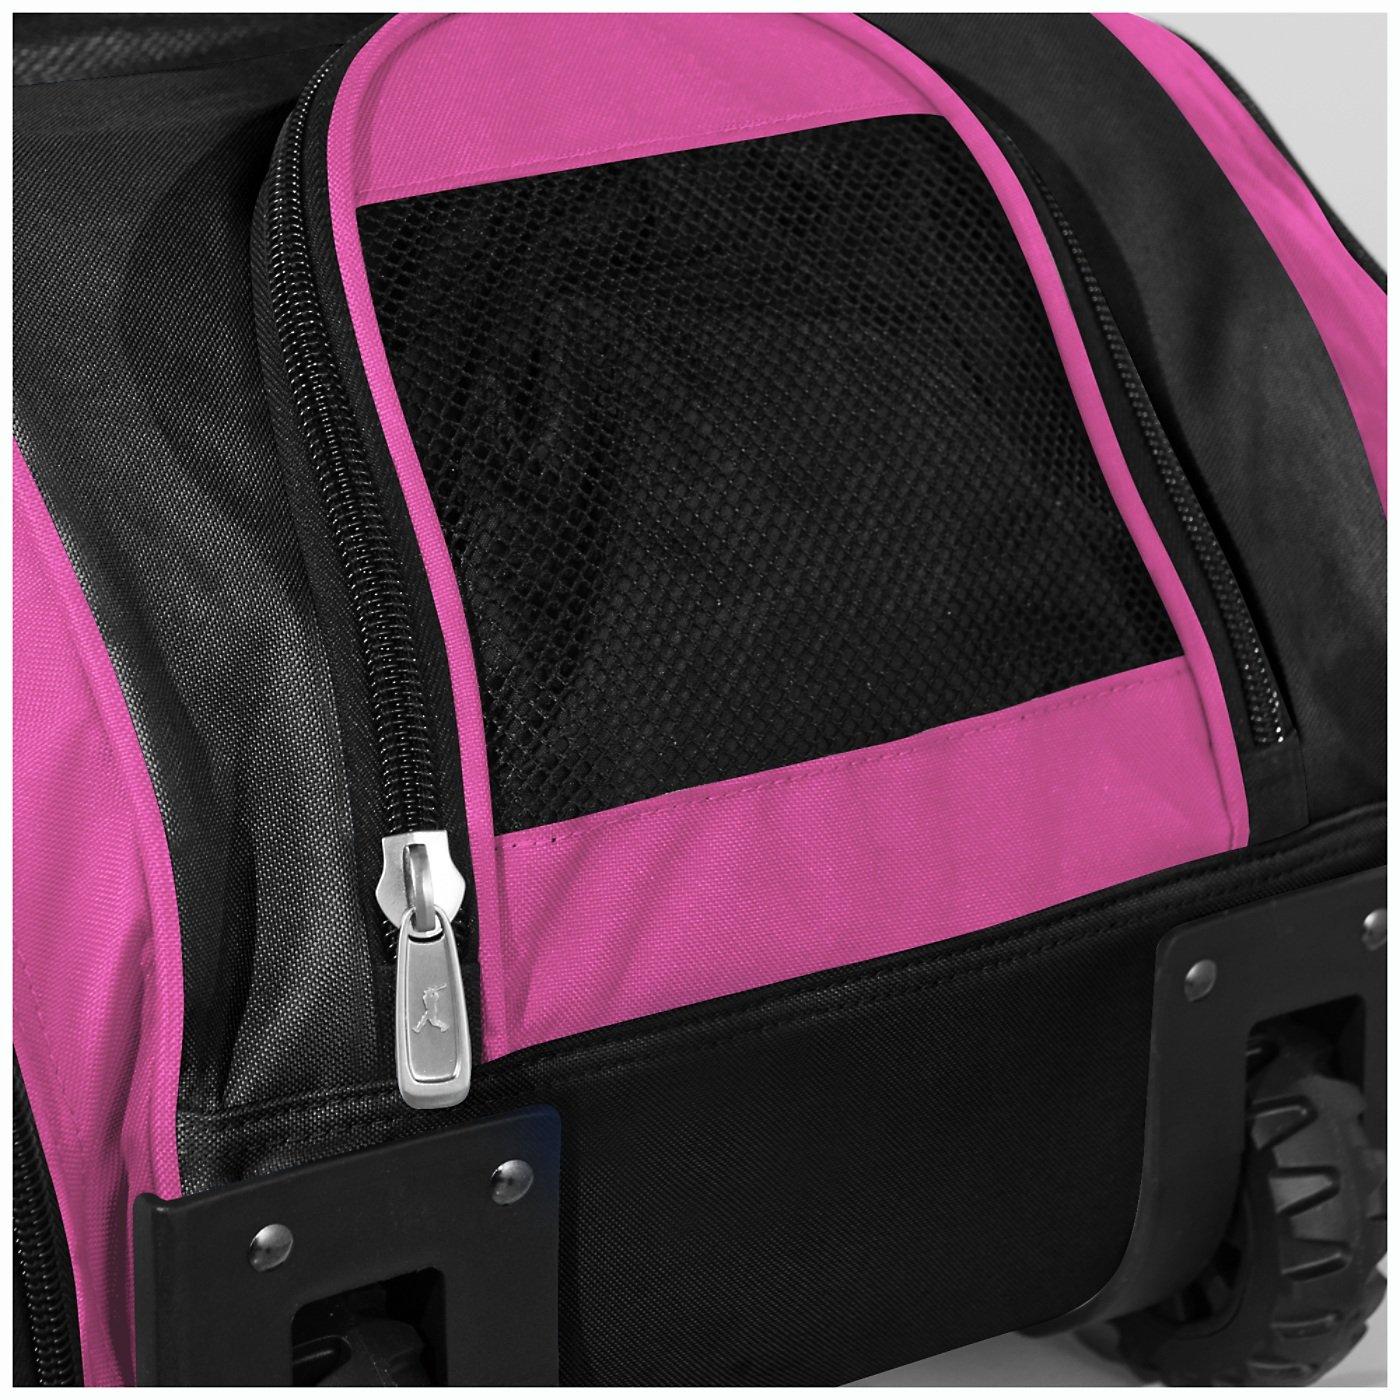 Boombah Beast Baseball/Softball Bat Bag - 40'' x 14'' x 13'' - Black/Pink - Holds 8 Bats, Glove & Shoe Compartments by Boombah (Image #4)